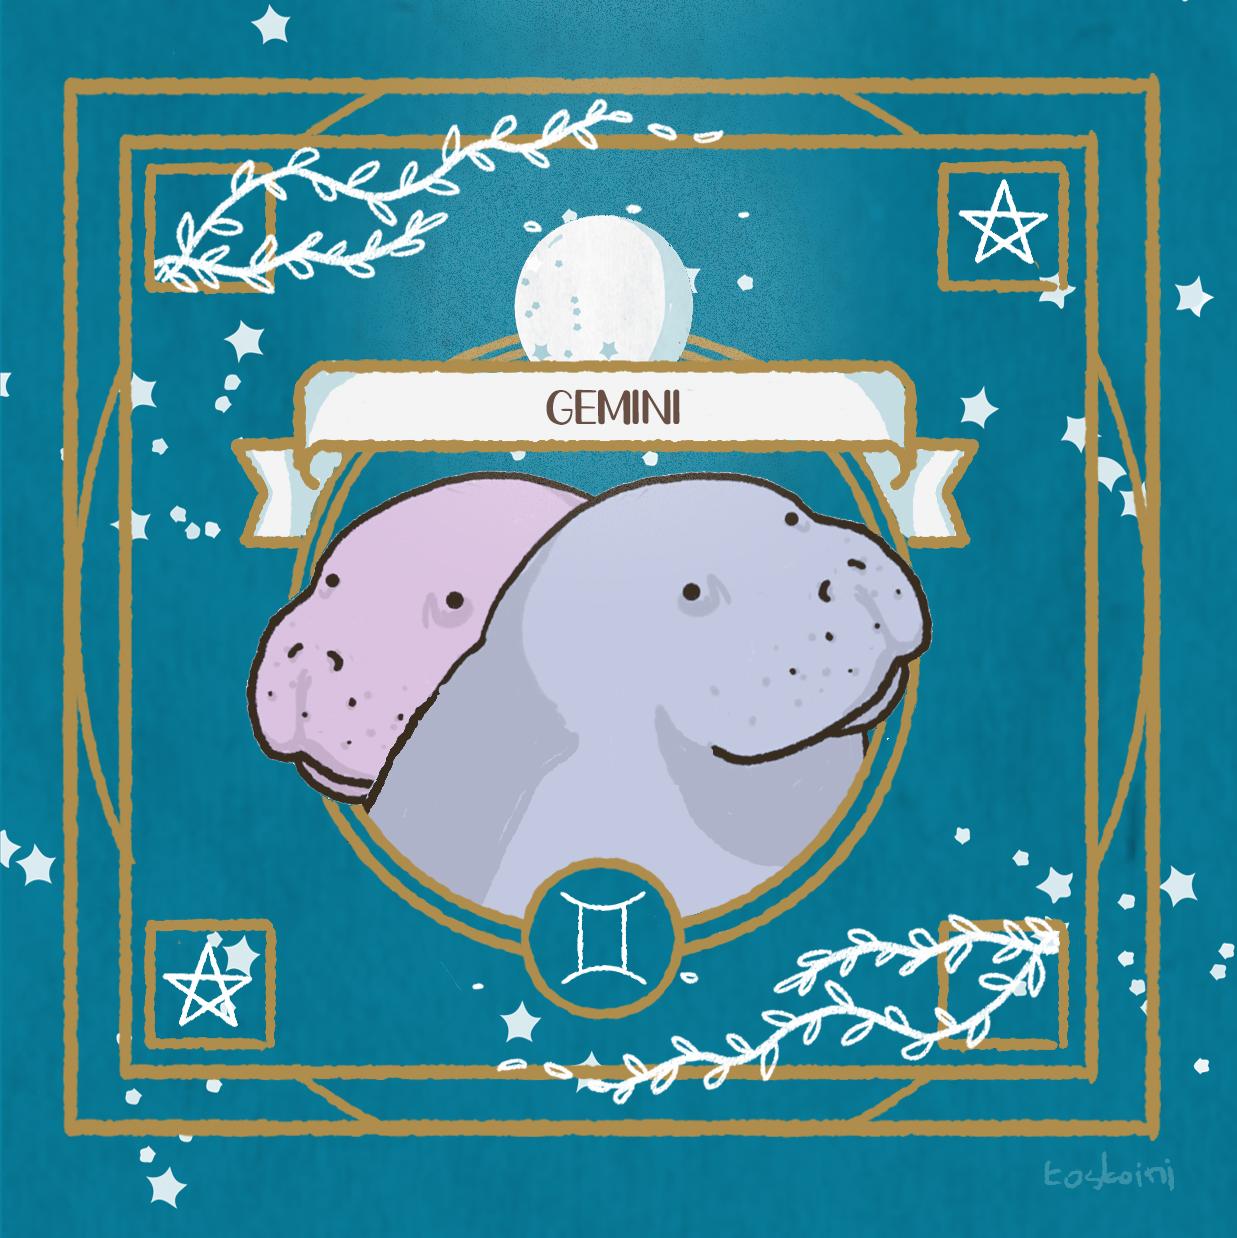 gemini-lamentino-manatee-horoscope-tostoini